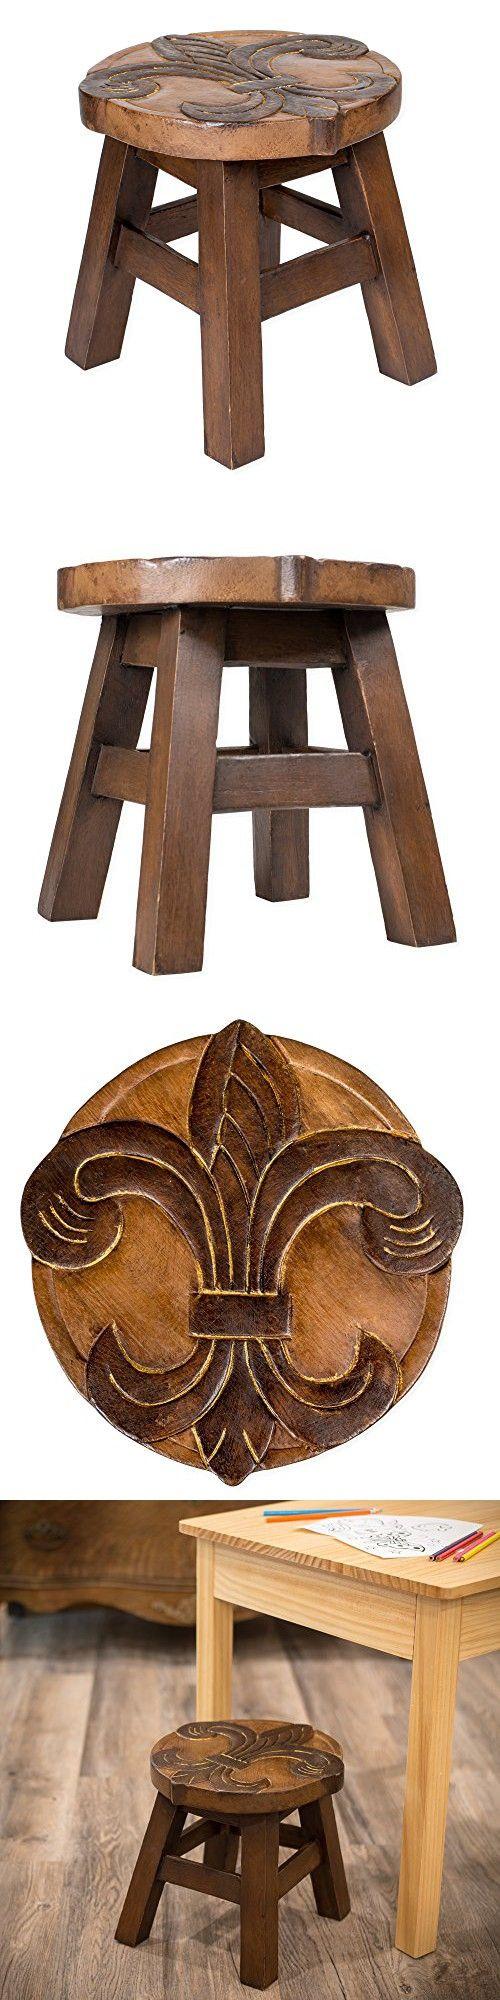 Fleur de Lis Design Hand Carved Acacia Hardwood Decorative Short Stool